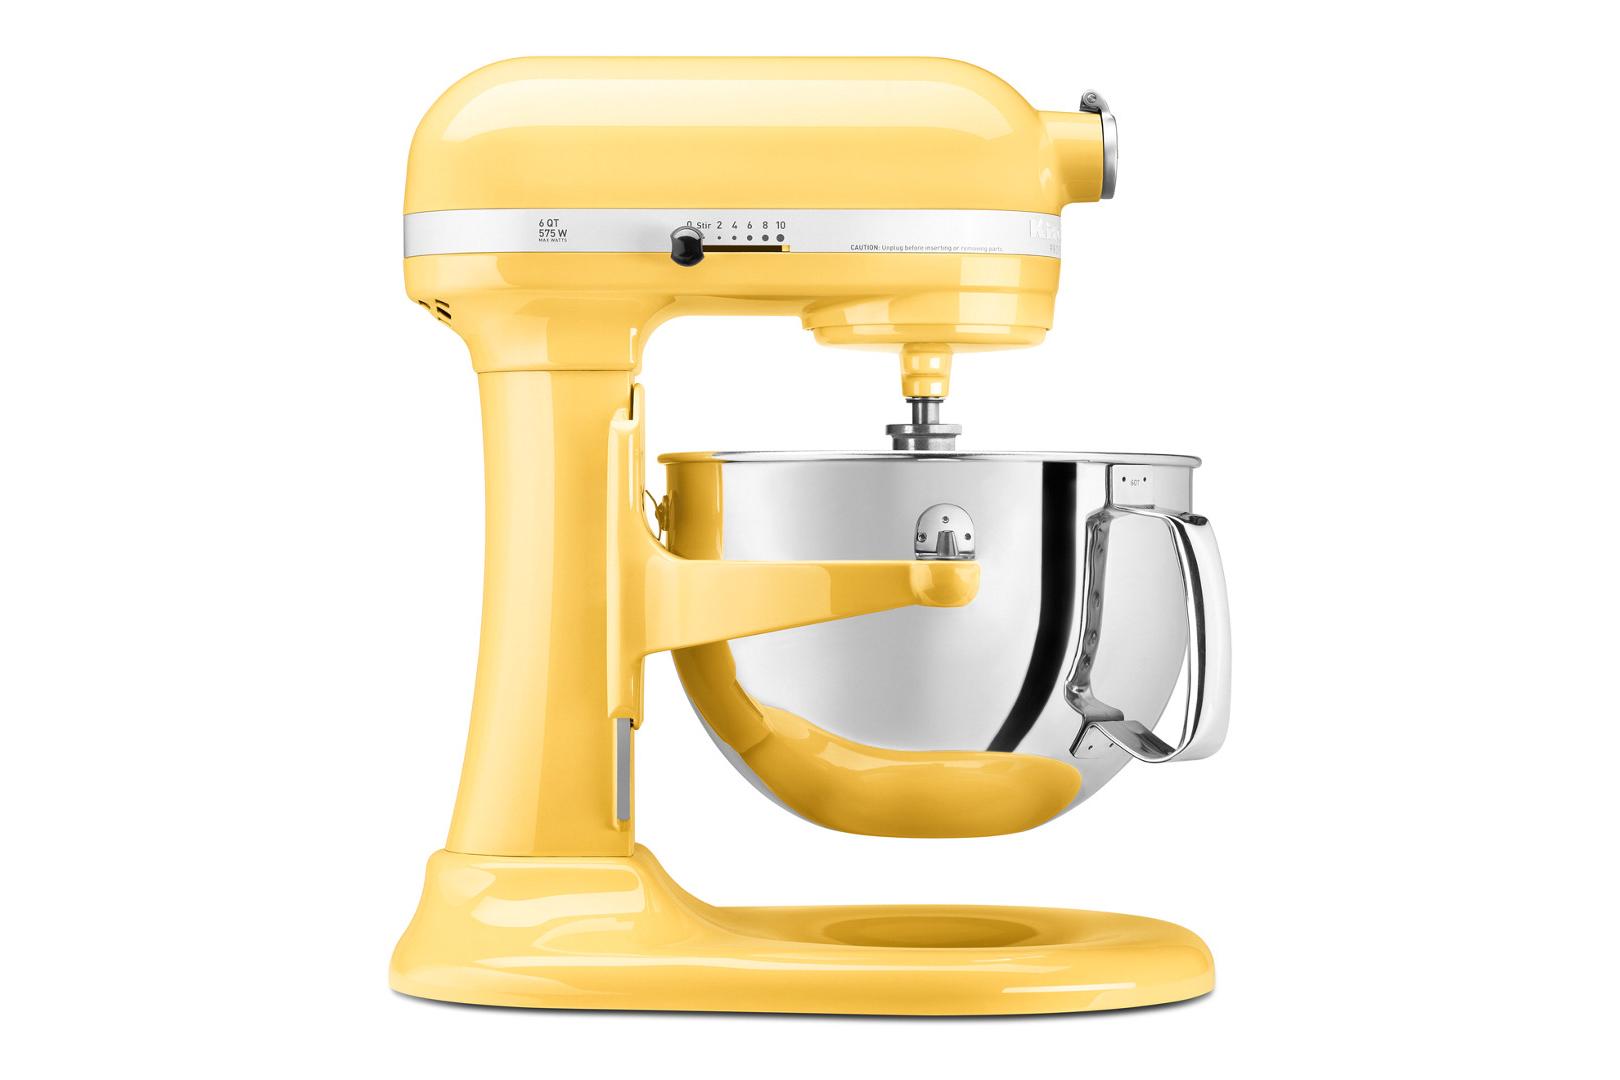 KitchenAid Professional 600 Series 6qt Bowl Lift Stand Mixer